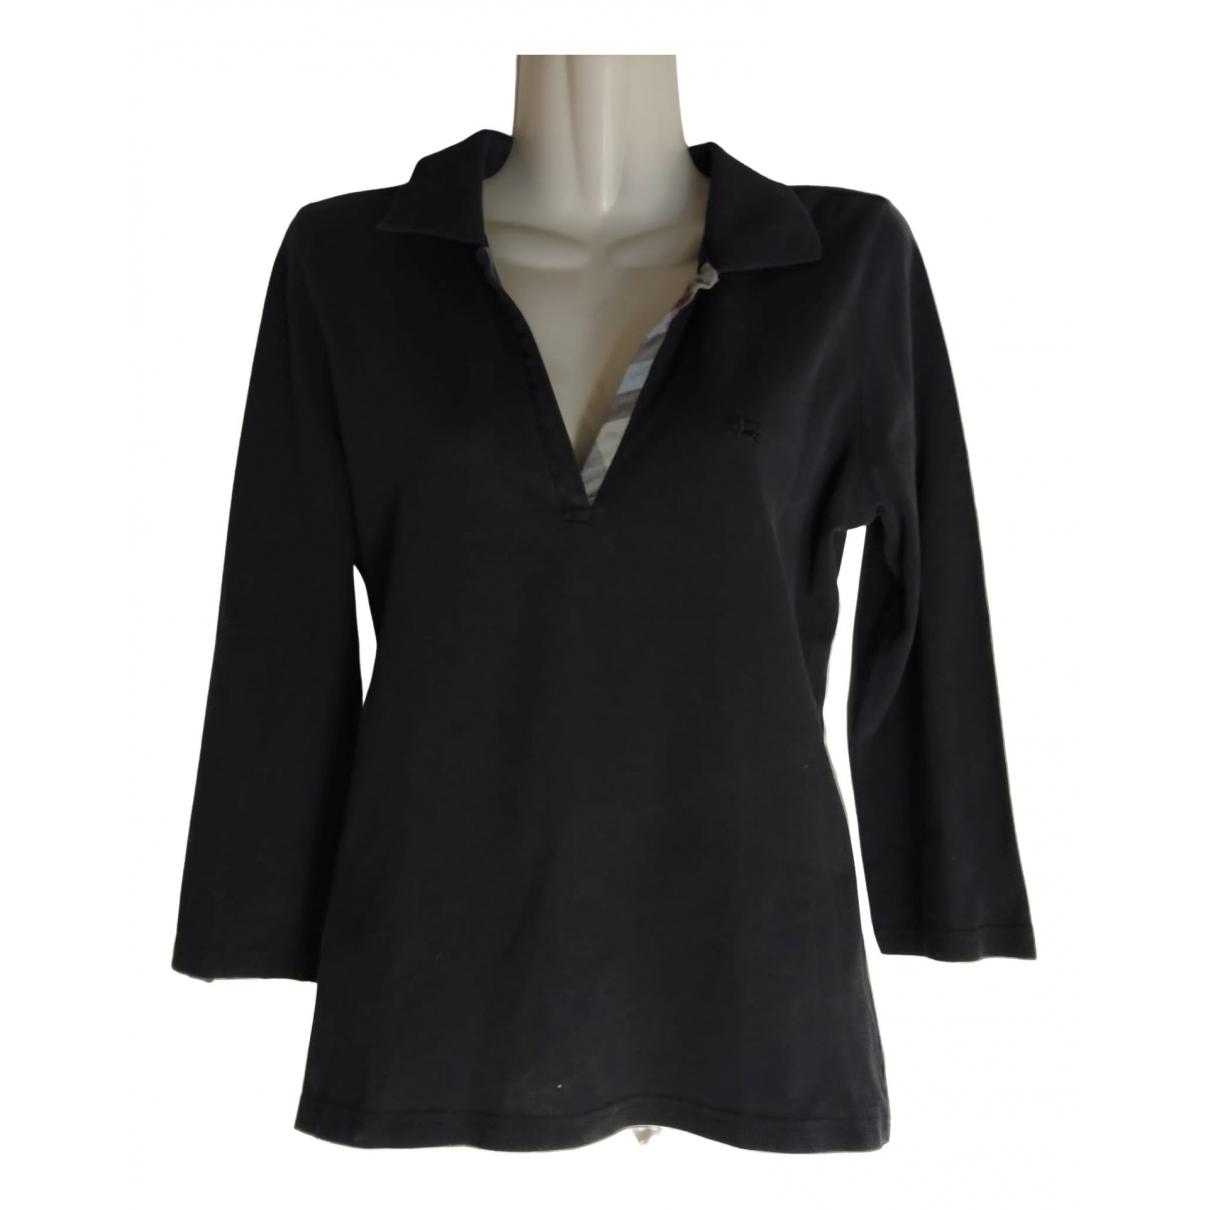 Burberry \N Black Cotton  top for Women M International